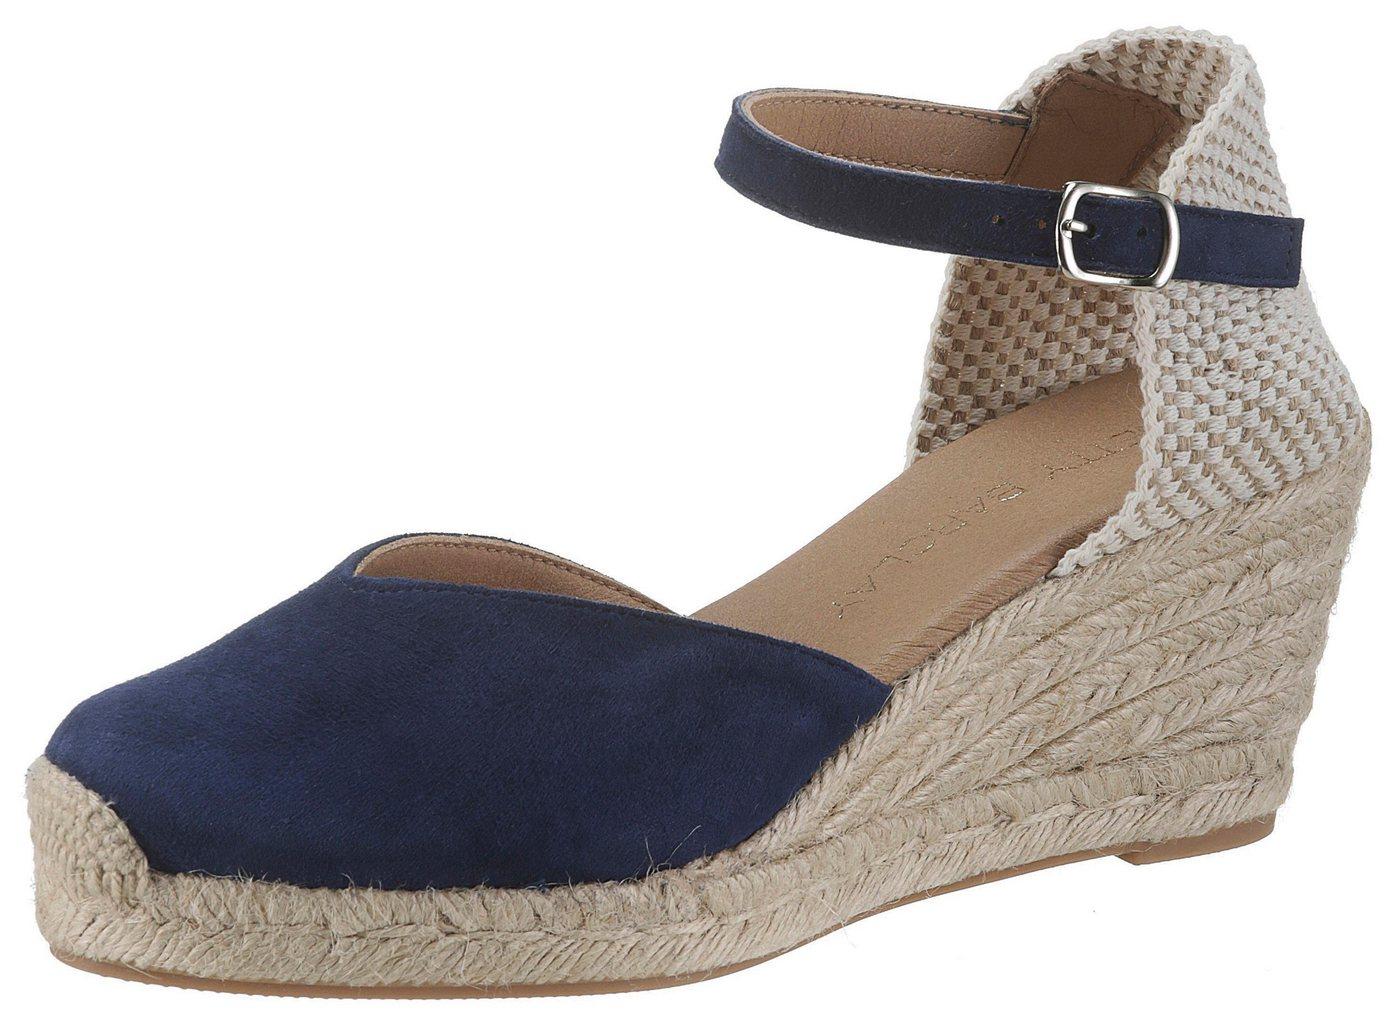 Betty Barclay Shoes Spangenpumps mit Juterand | Schuhe > Pumps > Spangenpumps | Blau | Betty Barclay Shoes